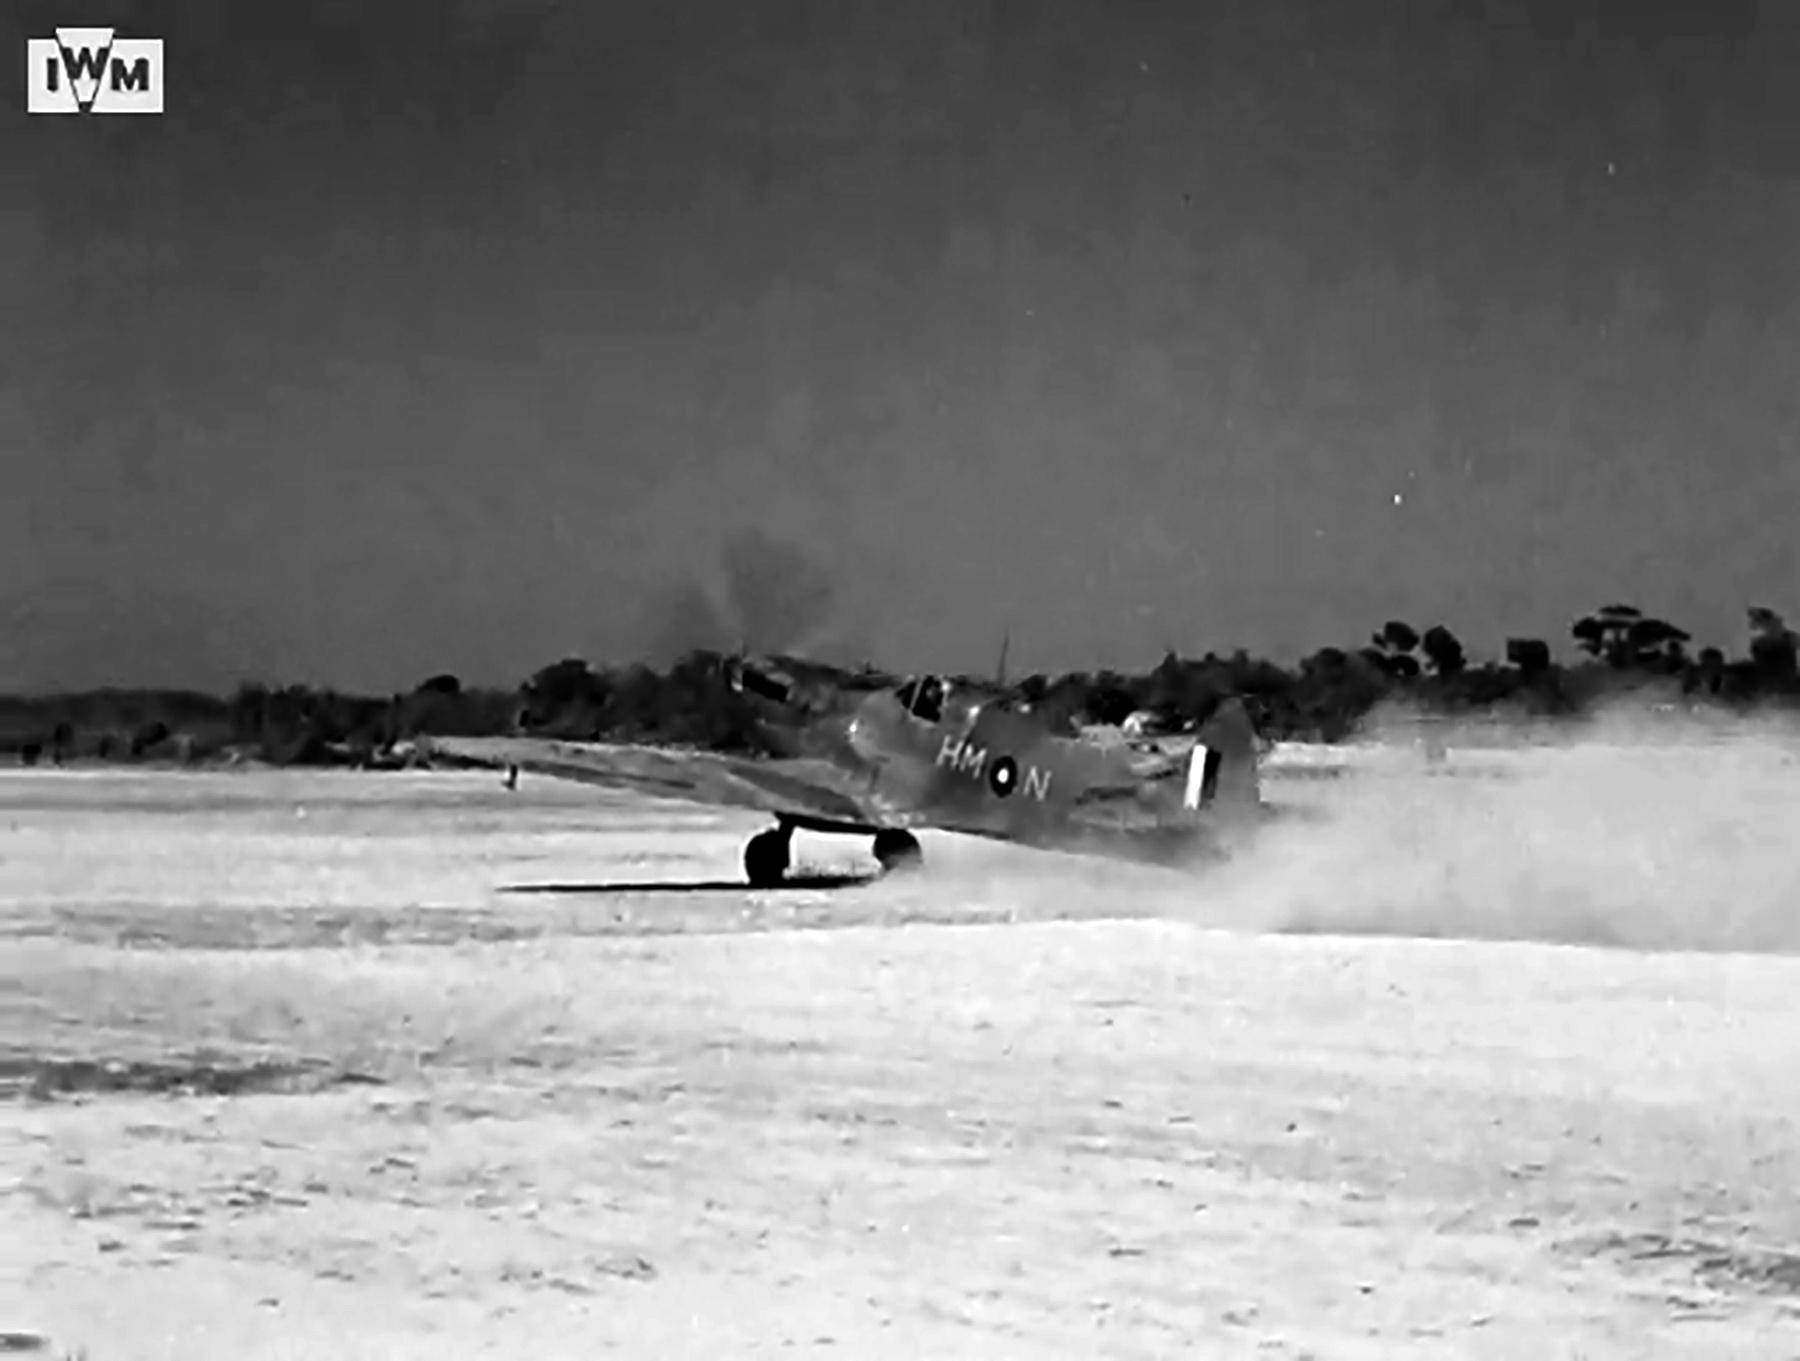 Spitfire VIII RAF 136Sqn HMN taking off from Rumkhapalong operating over Burma CBI 1944 IWM 01